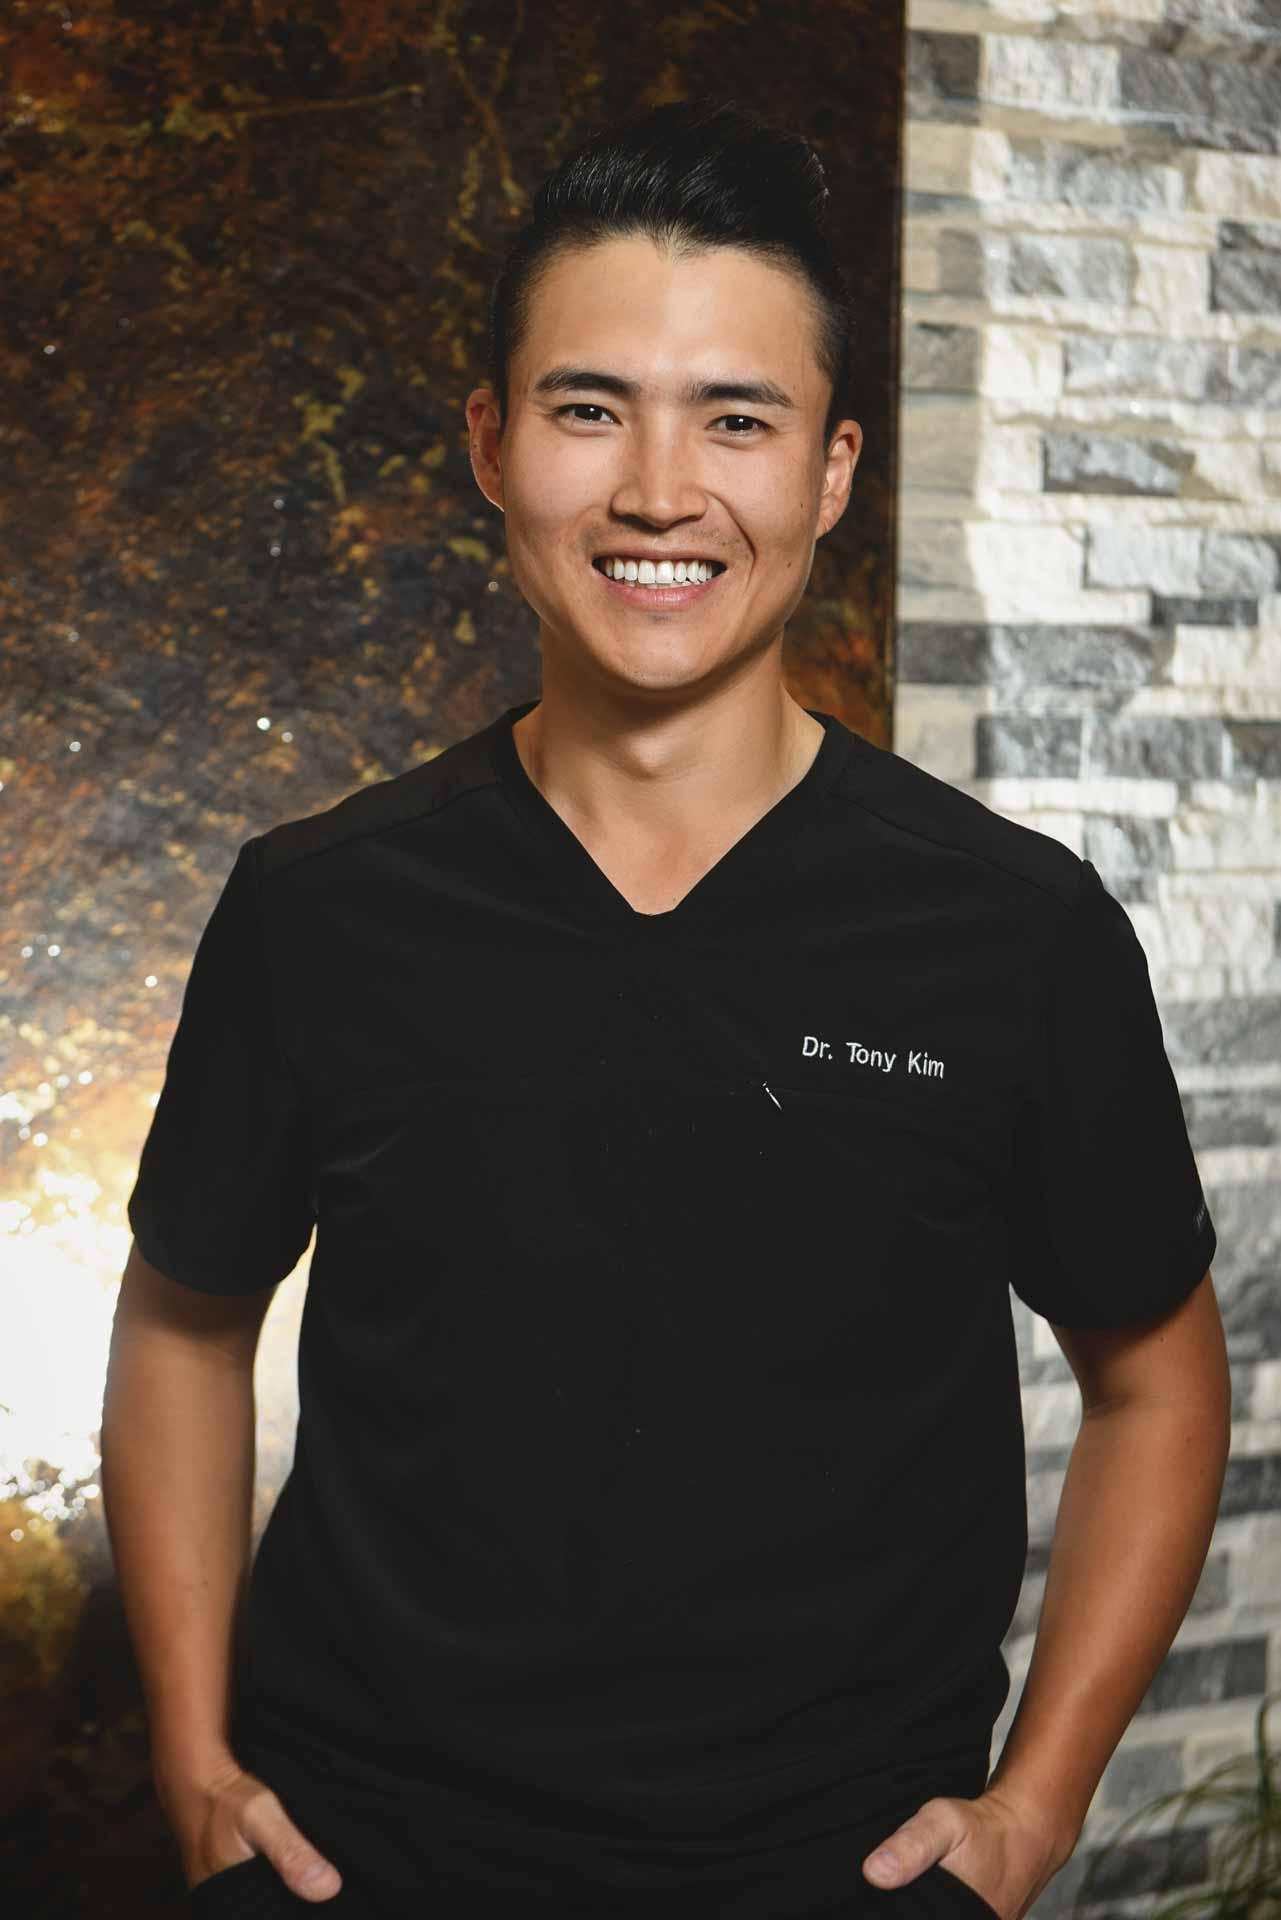 Dr. Tony Kim | NE Calgary Dentist | Pathways Dental Clinic